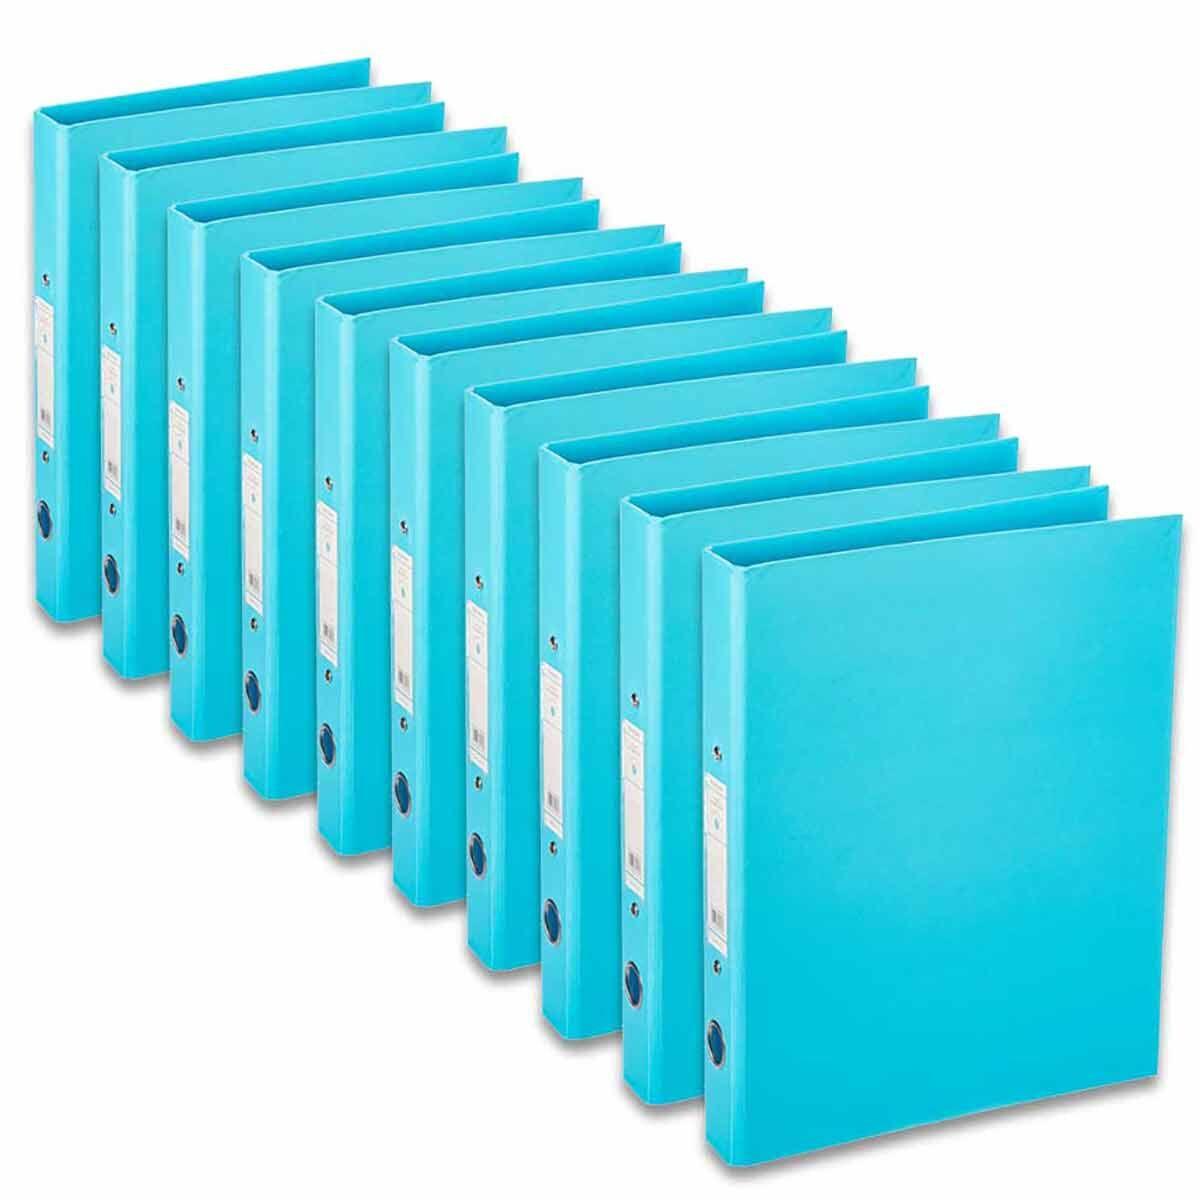 Ryman Premium Ring Binder A4 Pack of 10 Sky Blue